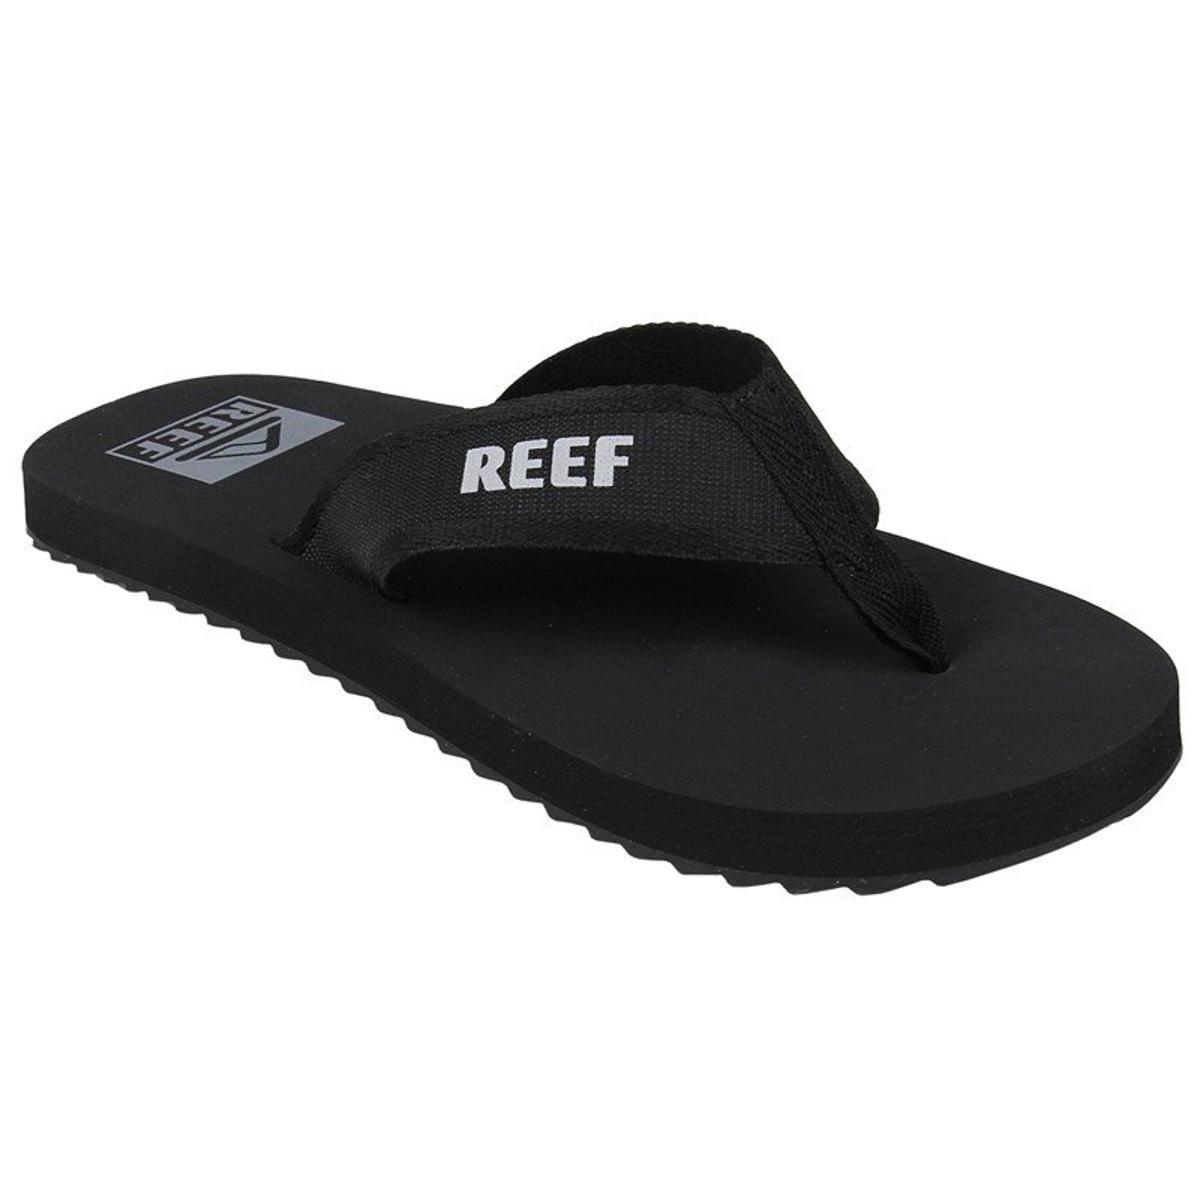 Chinelo Masculino Reef Clurg Basic - Preto - Compre Agora  e444466fd8a